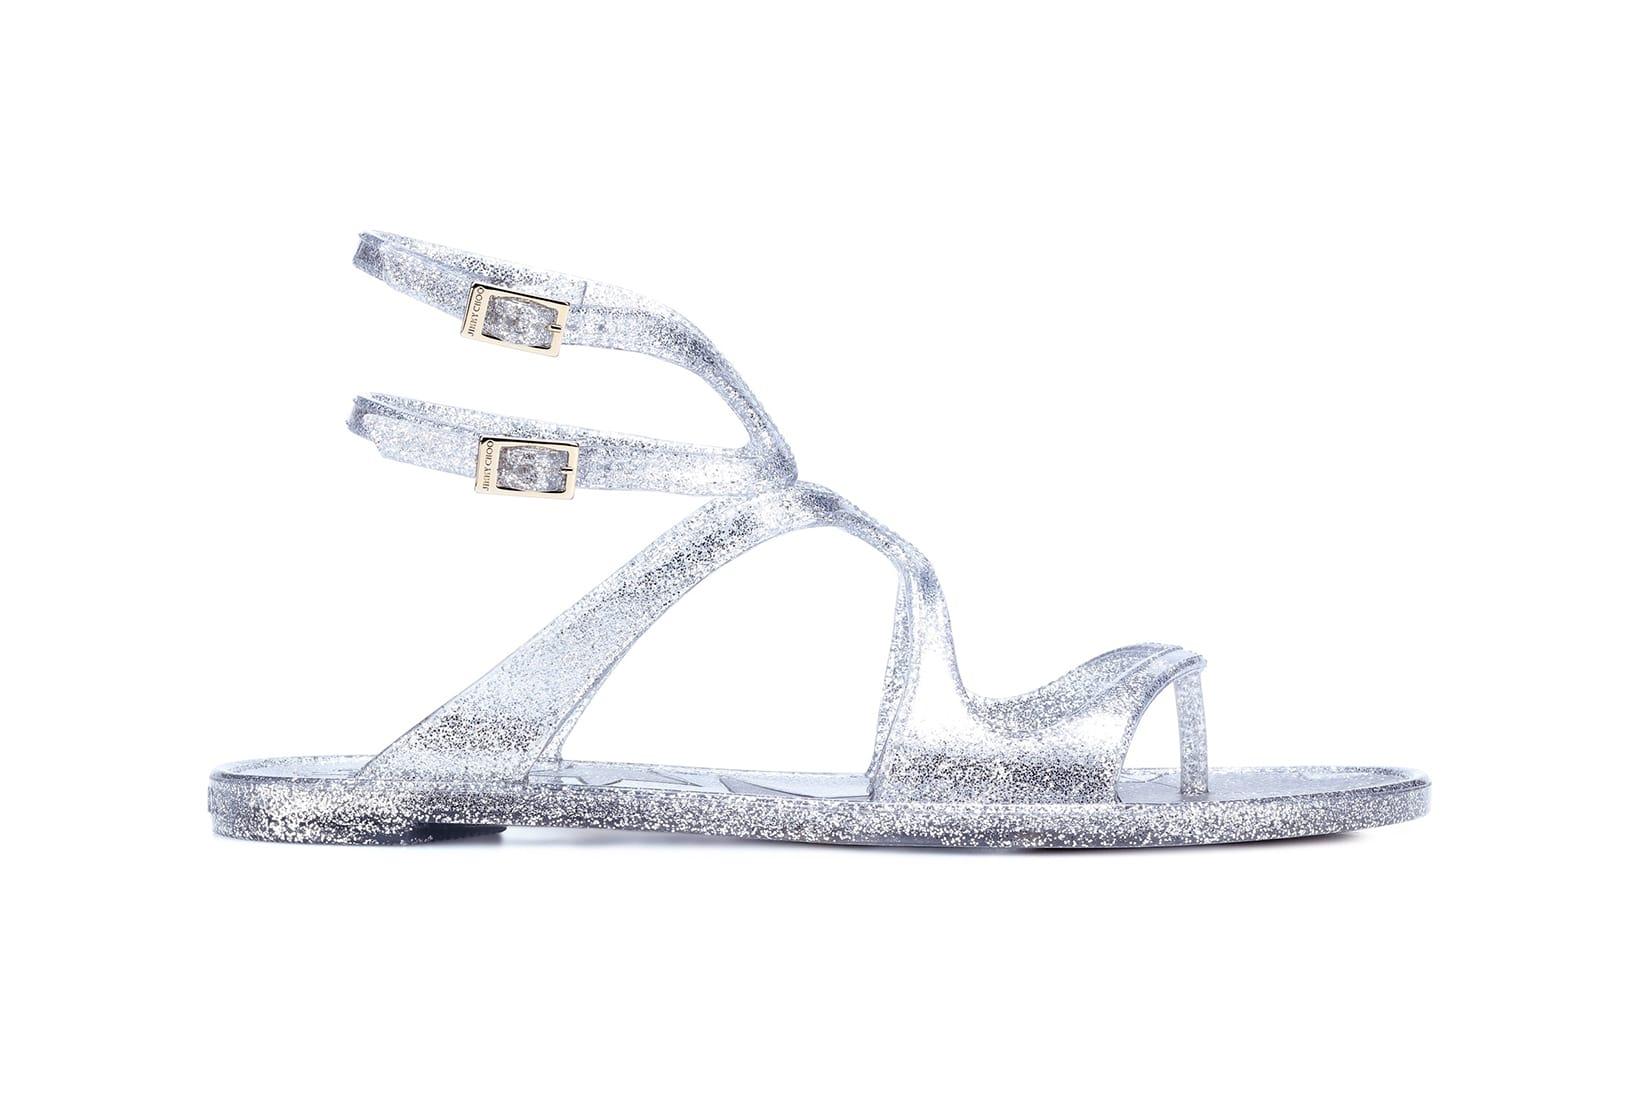 Jimmy Choo Silver Glitter Jelly Sandals